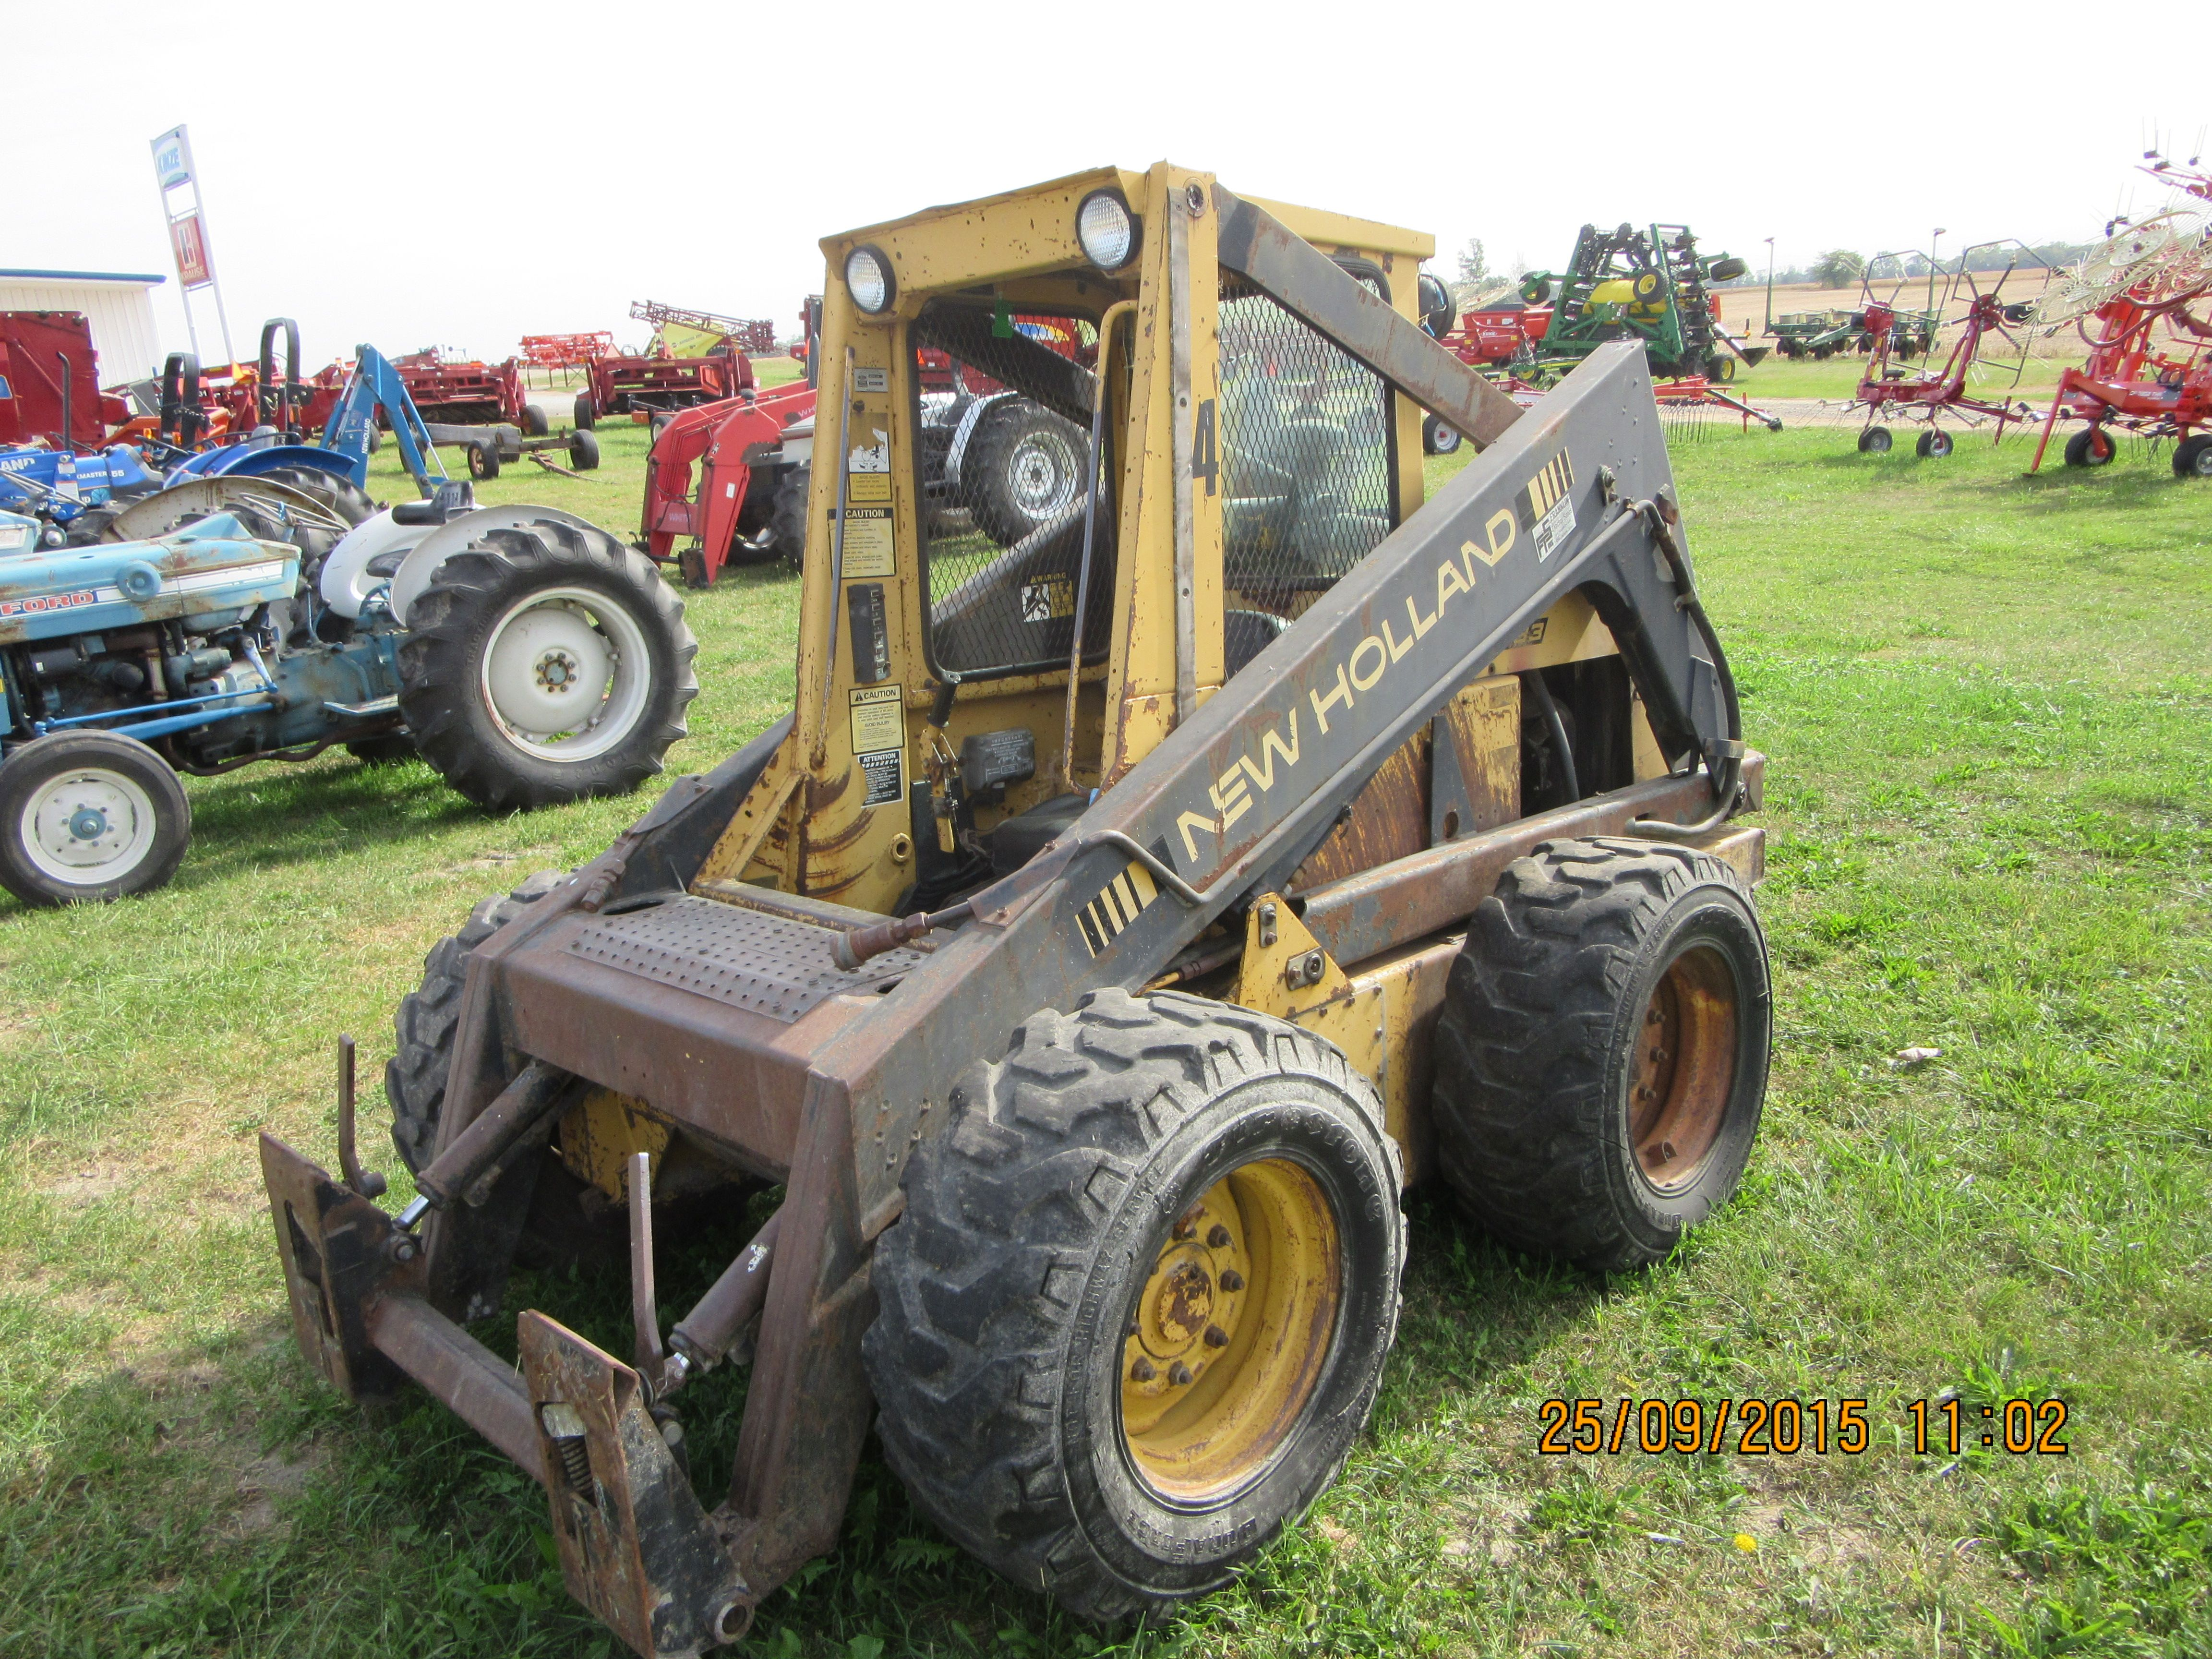 98df6f941b86 New Holland L783 skid steer loader   New Holland farm equipment ...